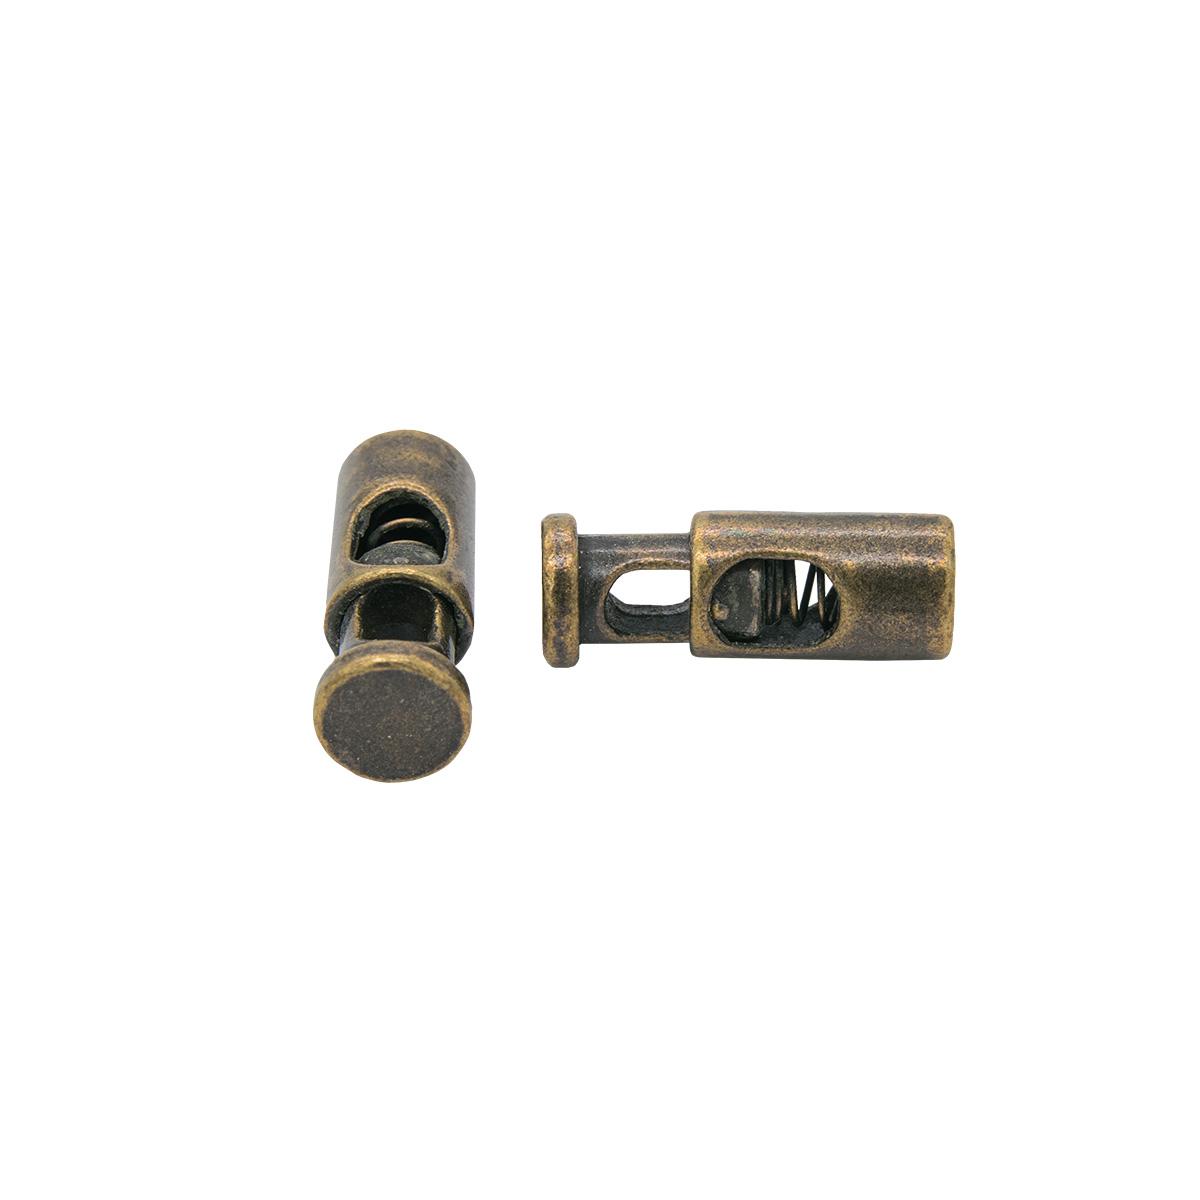 0305-5033 Стопор 'Цилиндр' d=3,5мм, 20*8мм, металл